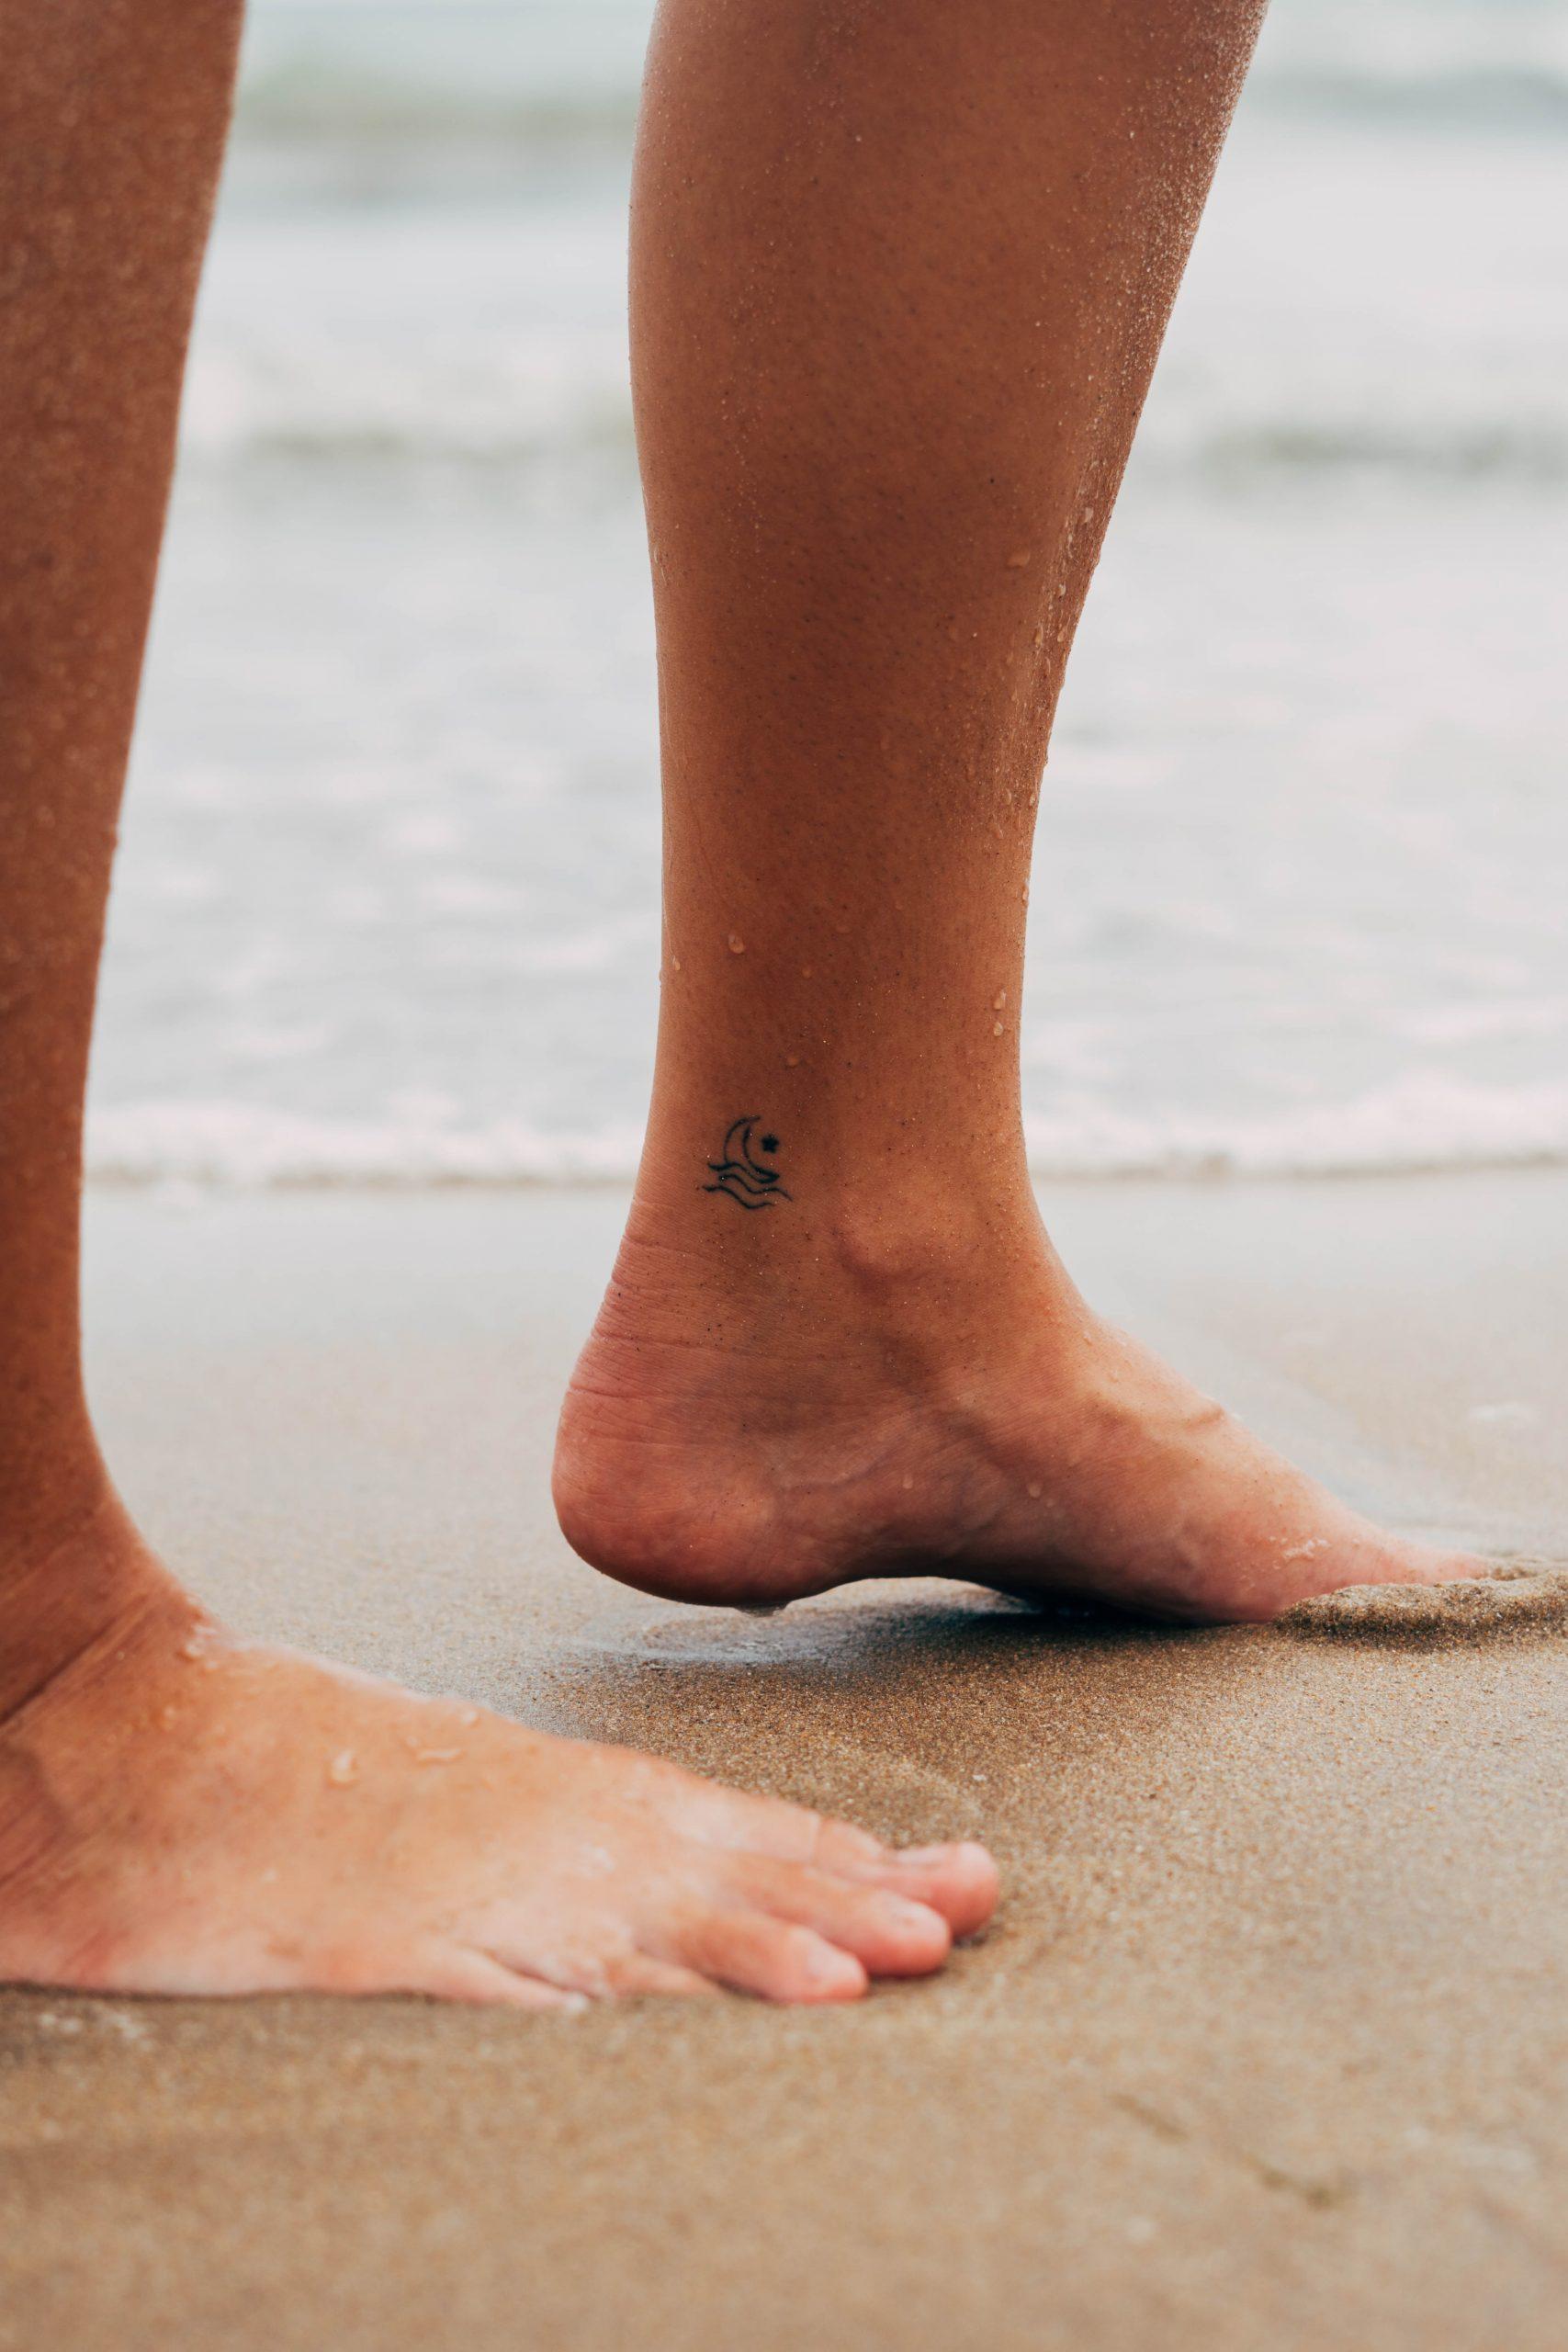 Never underestimate that Ankle Sprain!